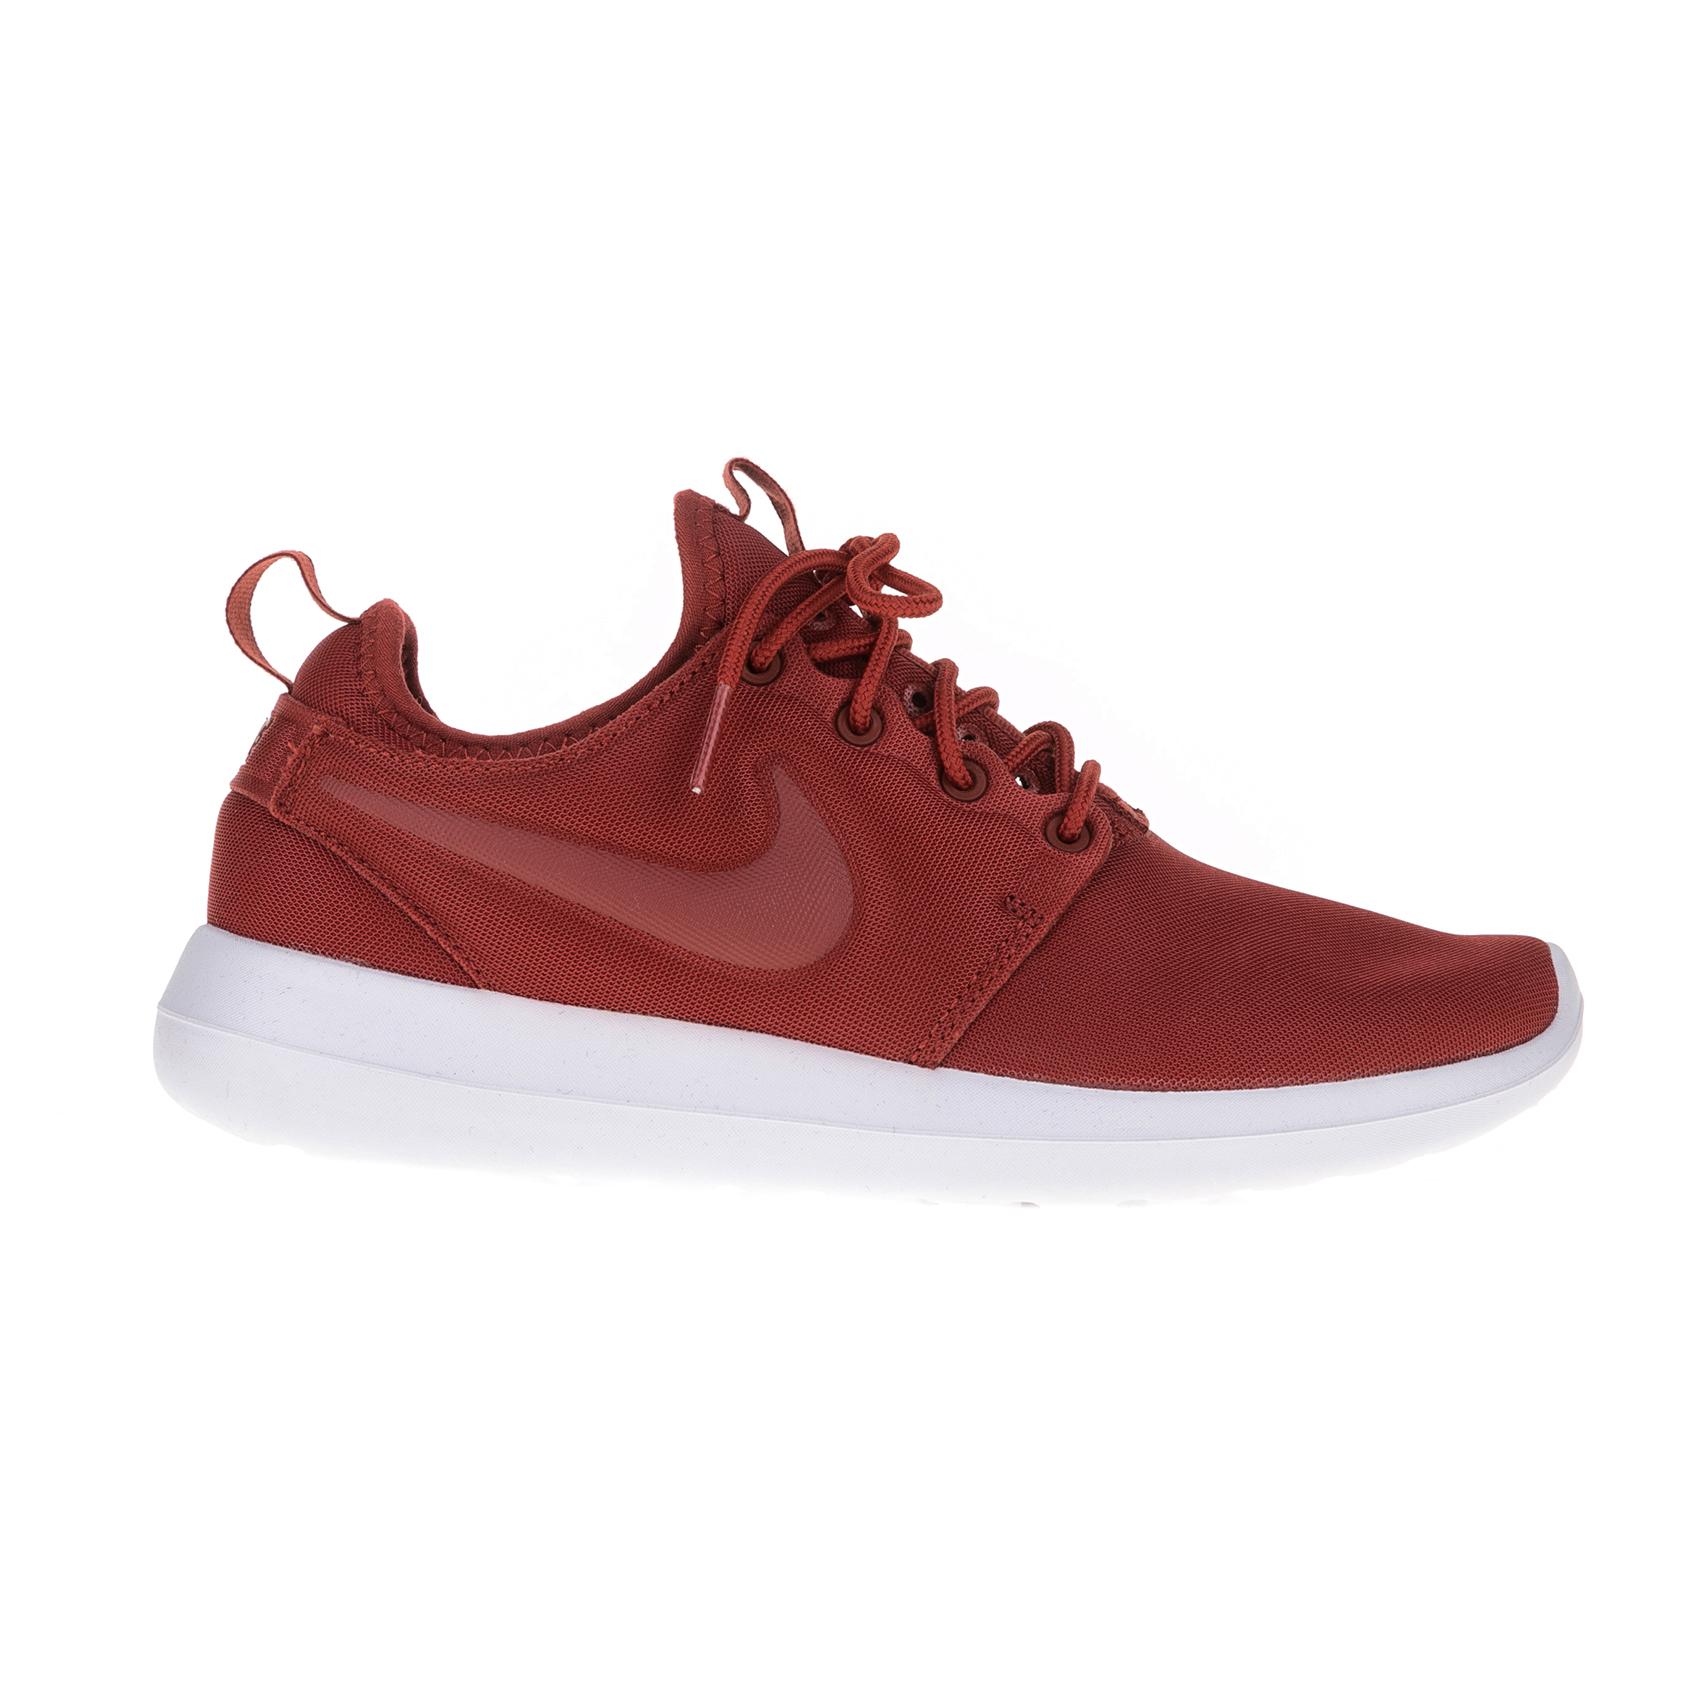 NIKE – Γυναικεία παπούτσια Nike ROSHE TWO κόκκινα